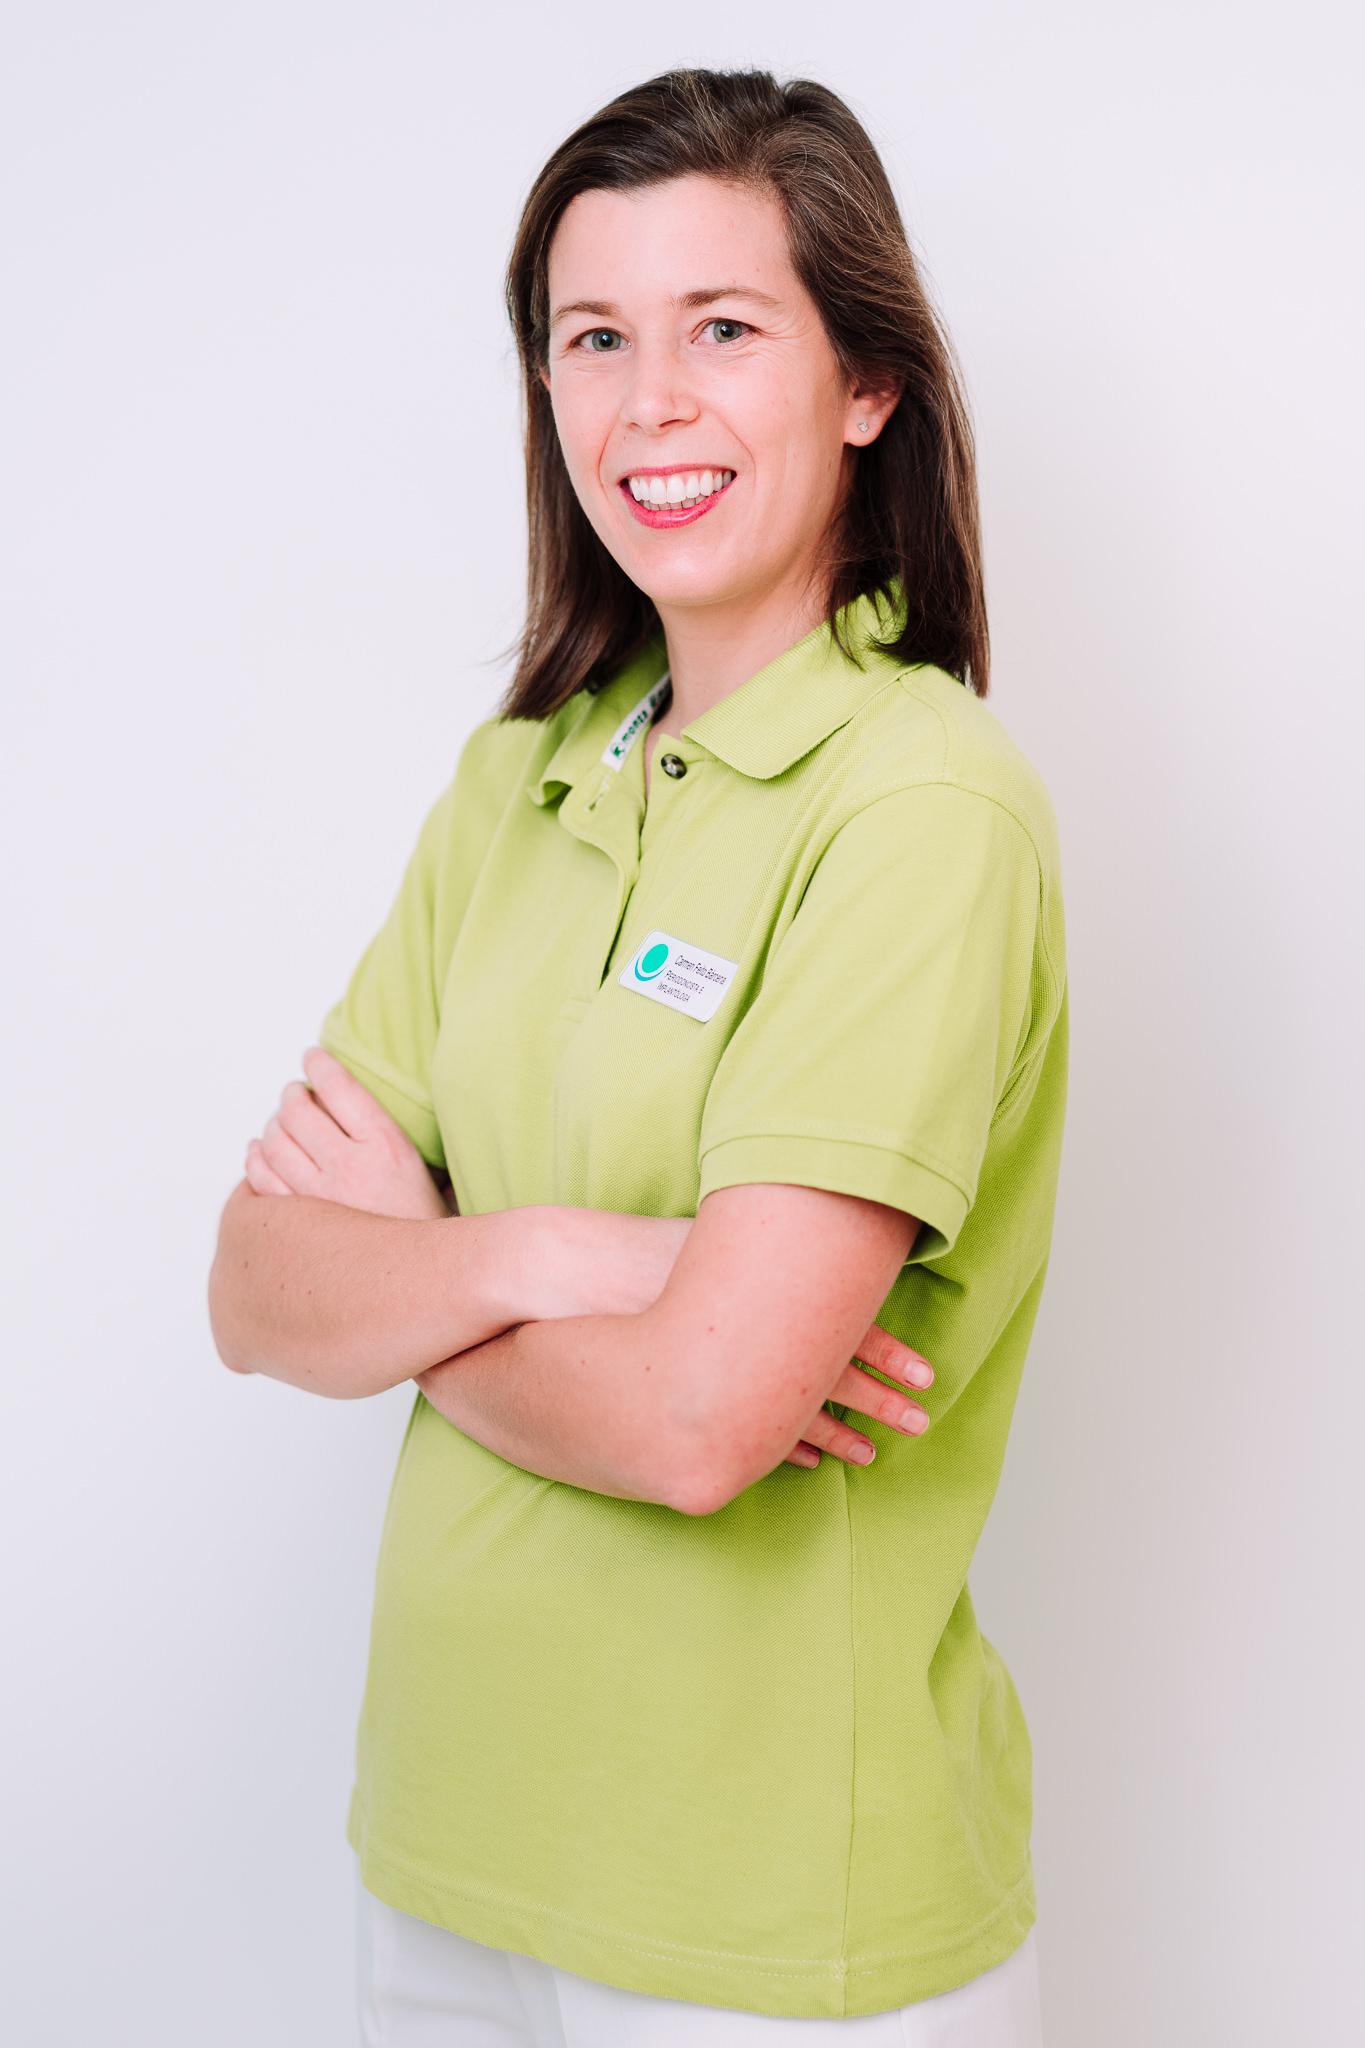 Dra. Carmen Feito